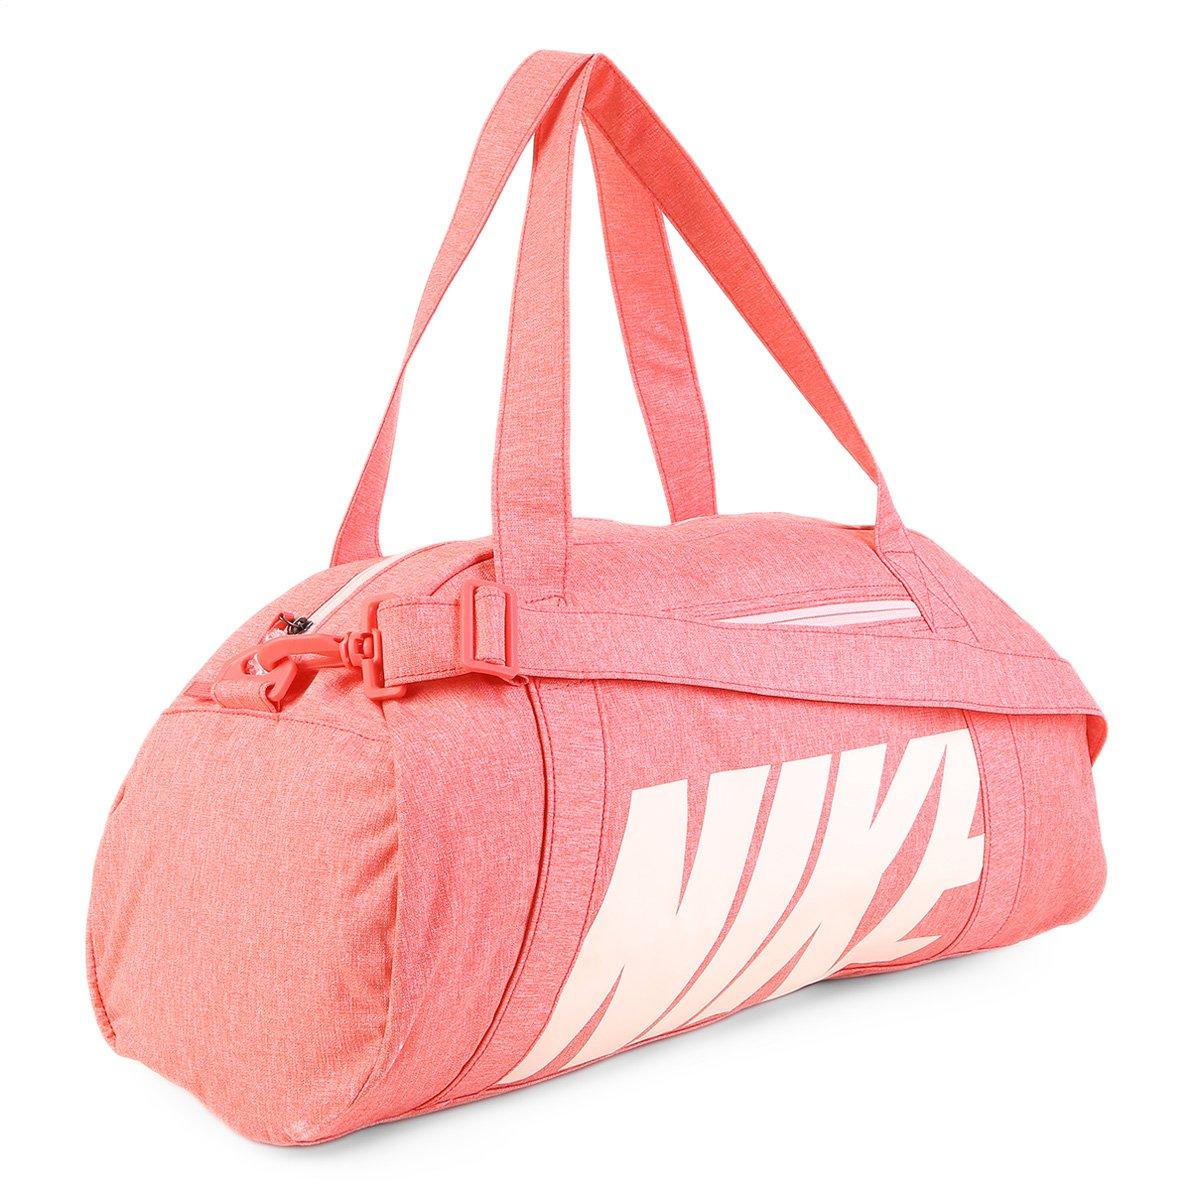 3de52bf69 Bolsa Nike Gym Club Feminina - Shopping TudoAzul